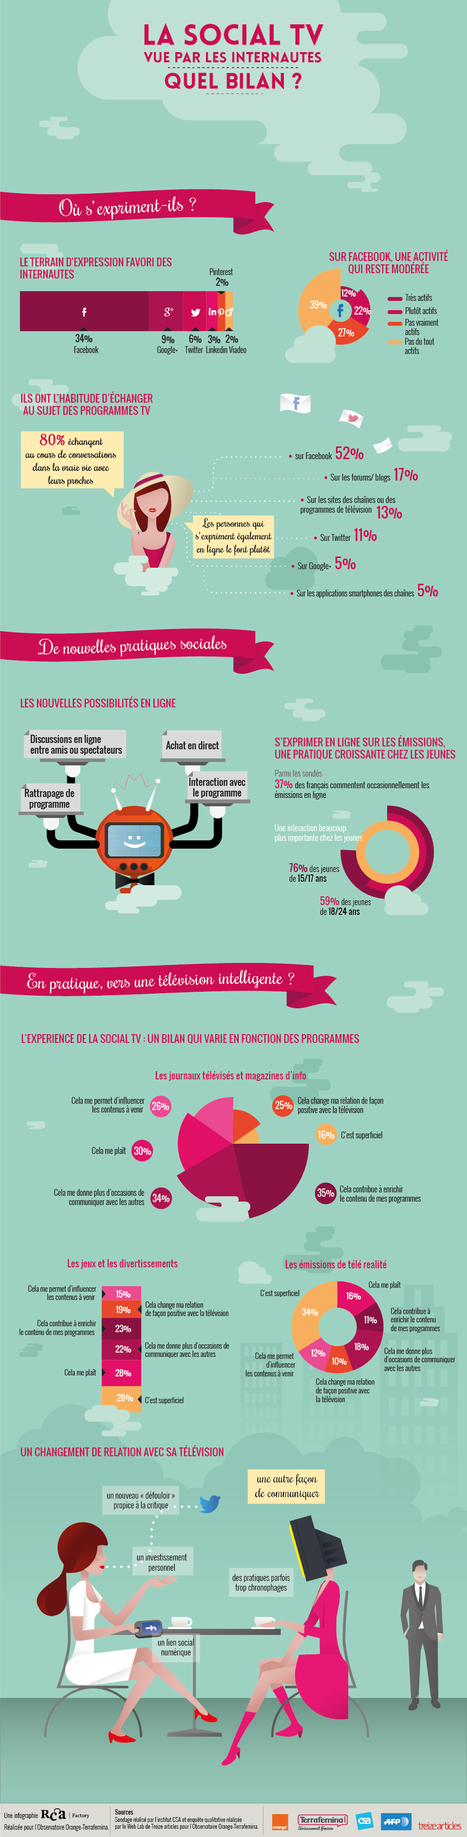 Social TV in France | Infographie | E-Transformation des médias (TV, Radio, Presse...) | Scoop.it